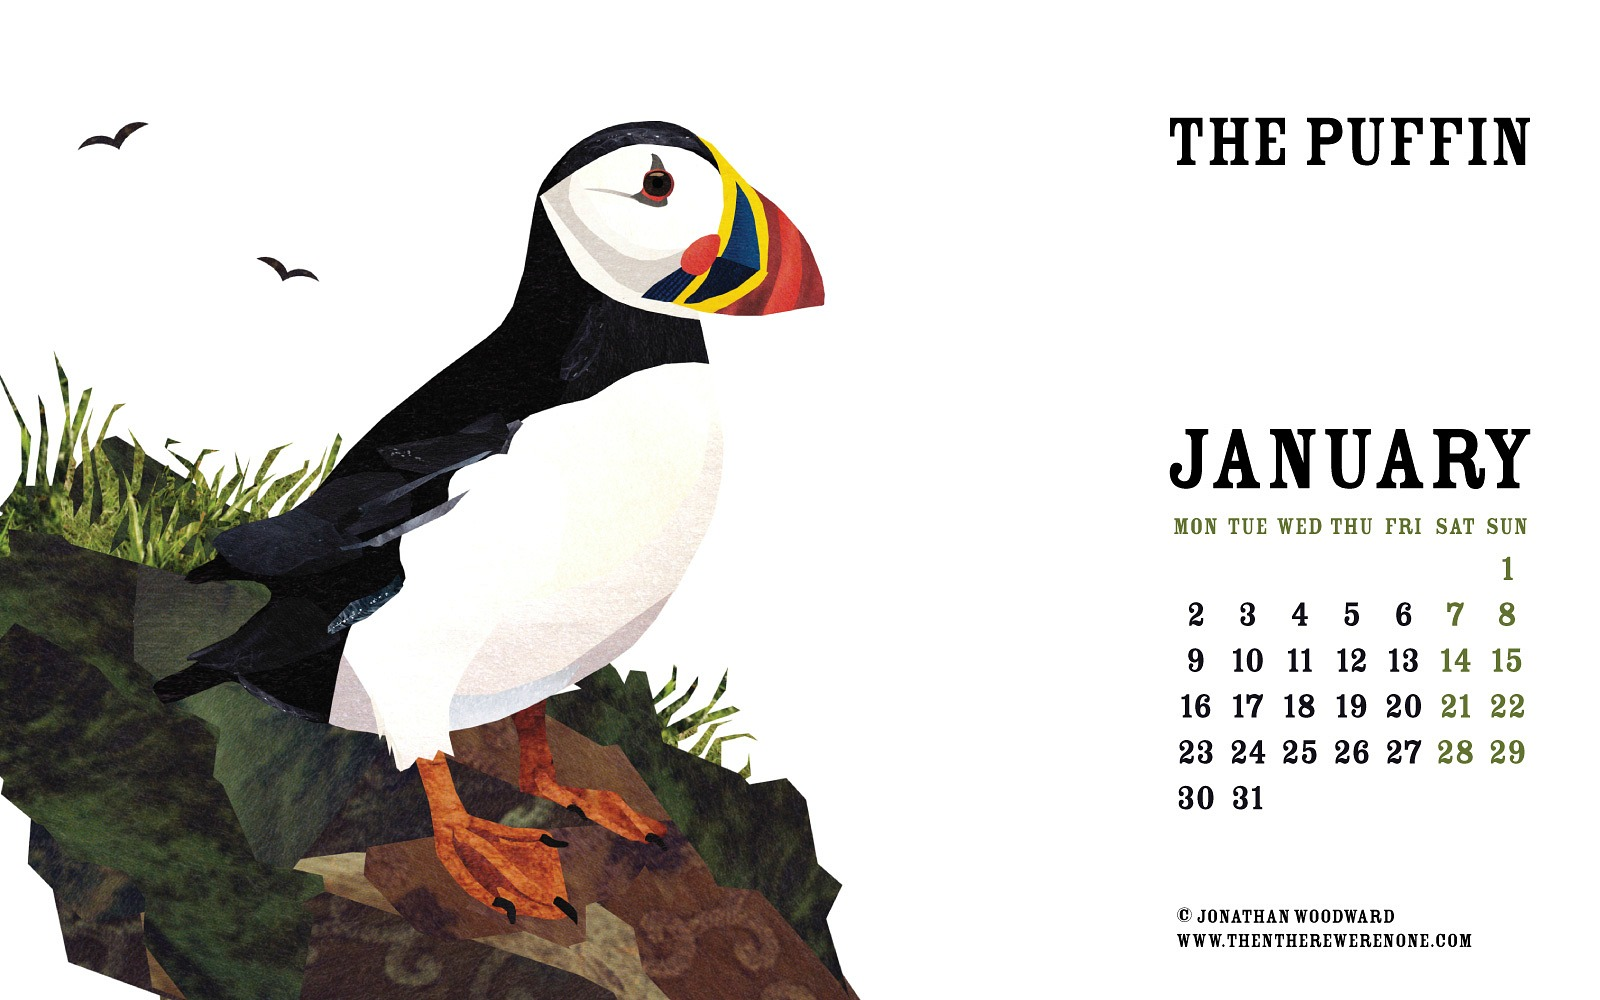 http://1.bp.blogspot.com/-dQnmpwhh_nM/TwE-LrvXxnI/AAAAAAAAEzo/Z2UKYQAnocU/s1600/TTWN-January-2012-wallpaper.jpg